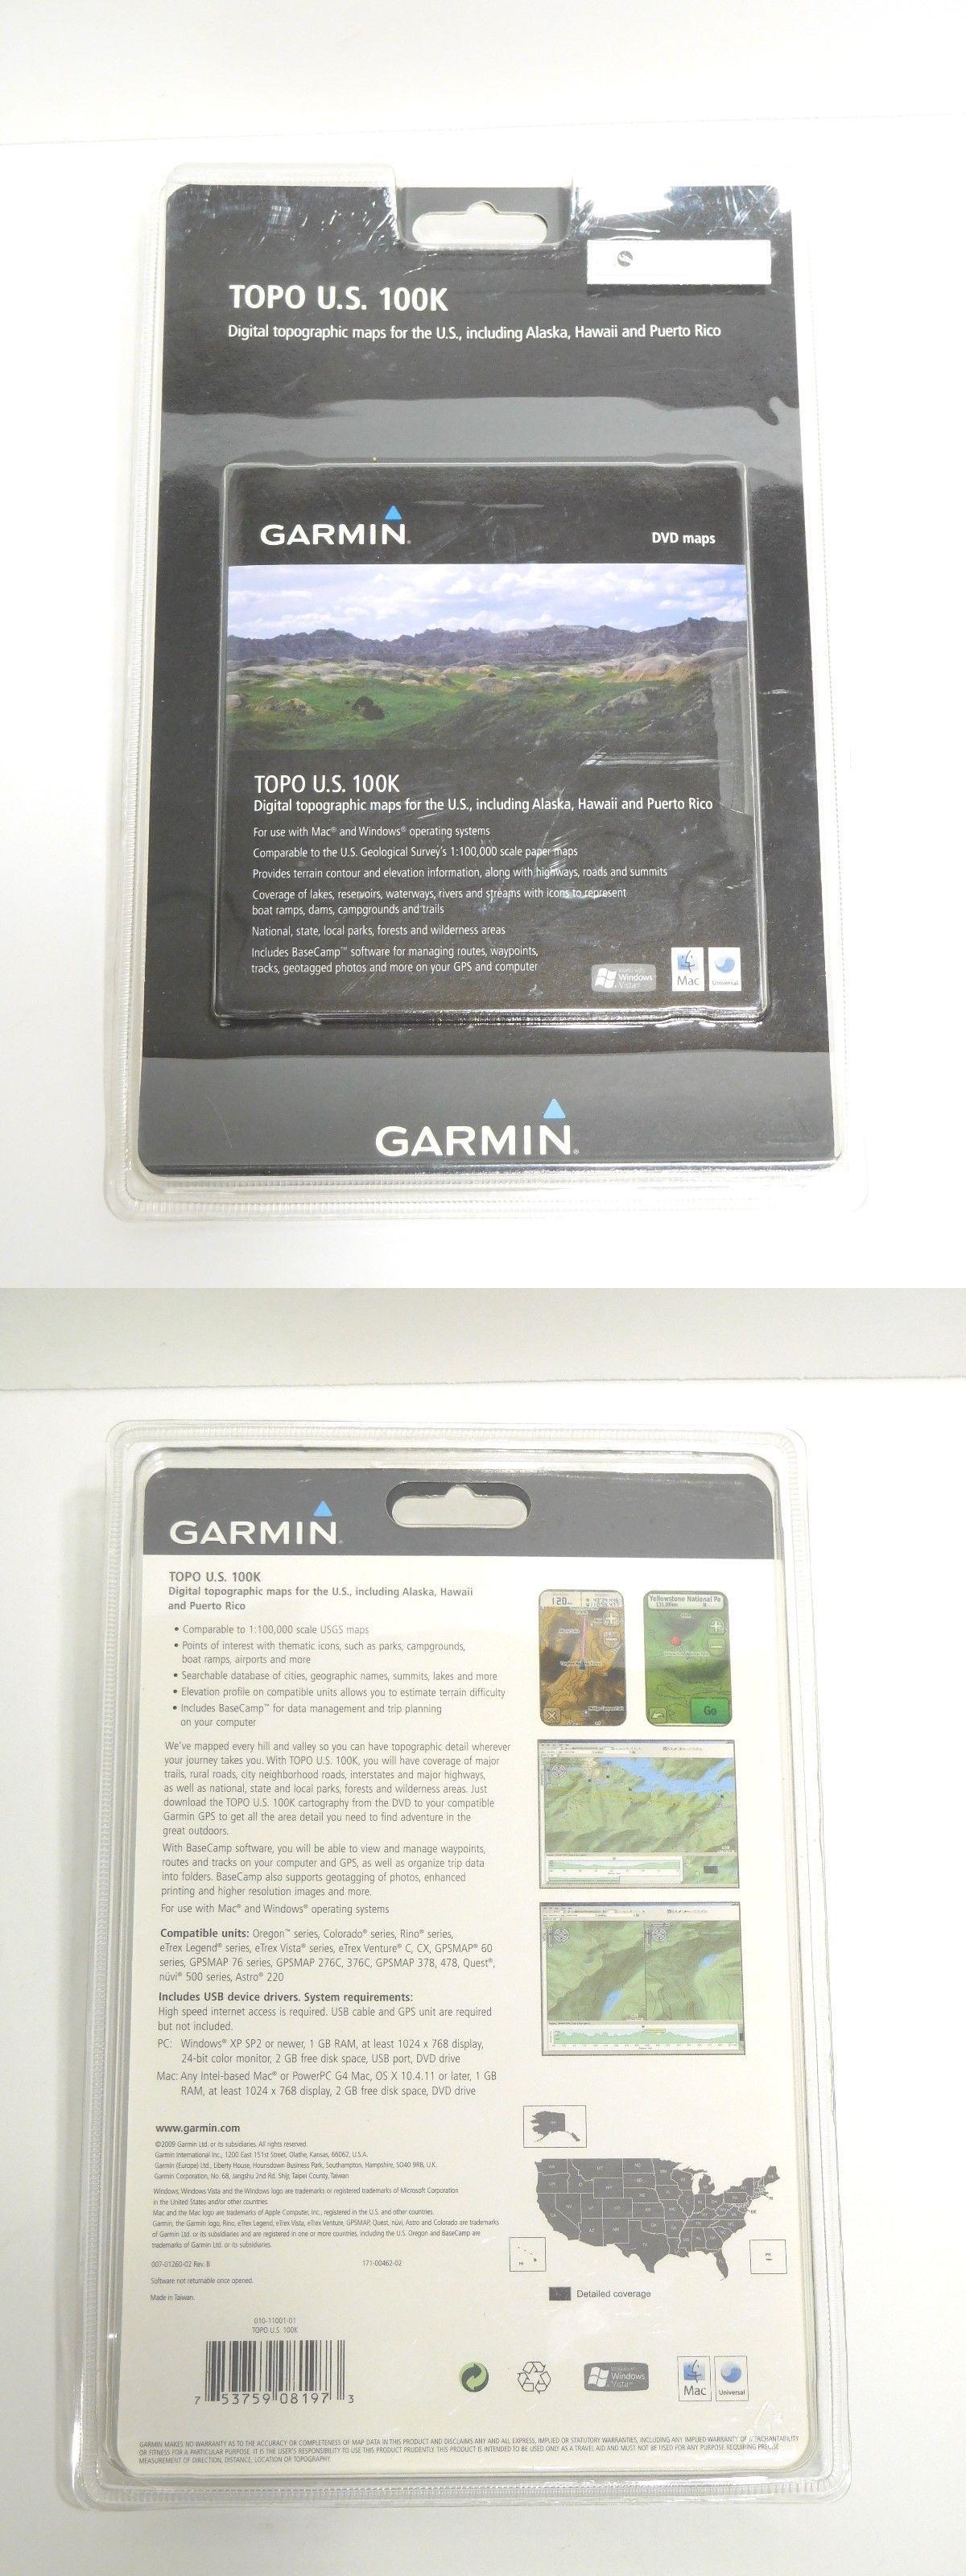 GPS Software And Maps Garmin Us Topo 100K Digital Topographic - Buy Us Topo24k Garmin Maps